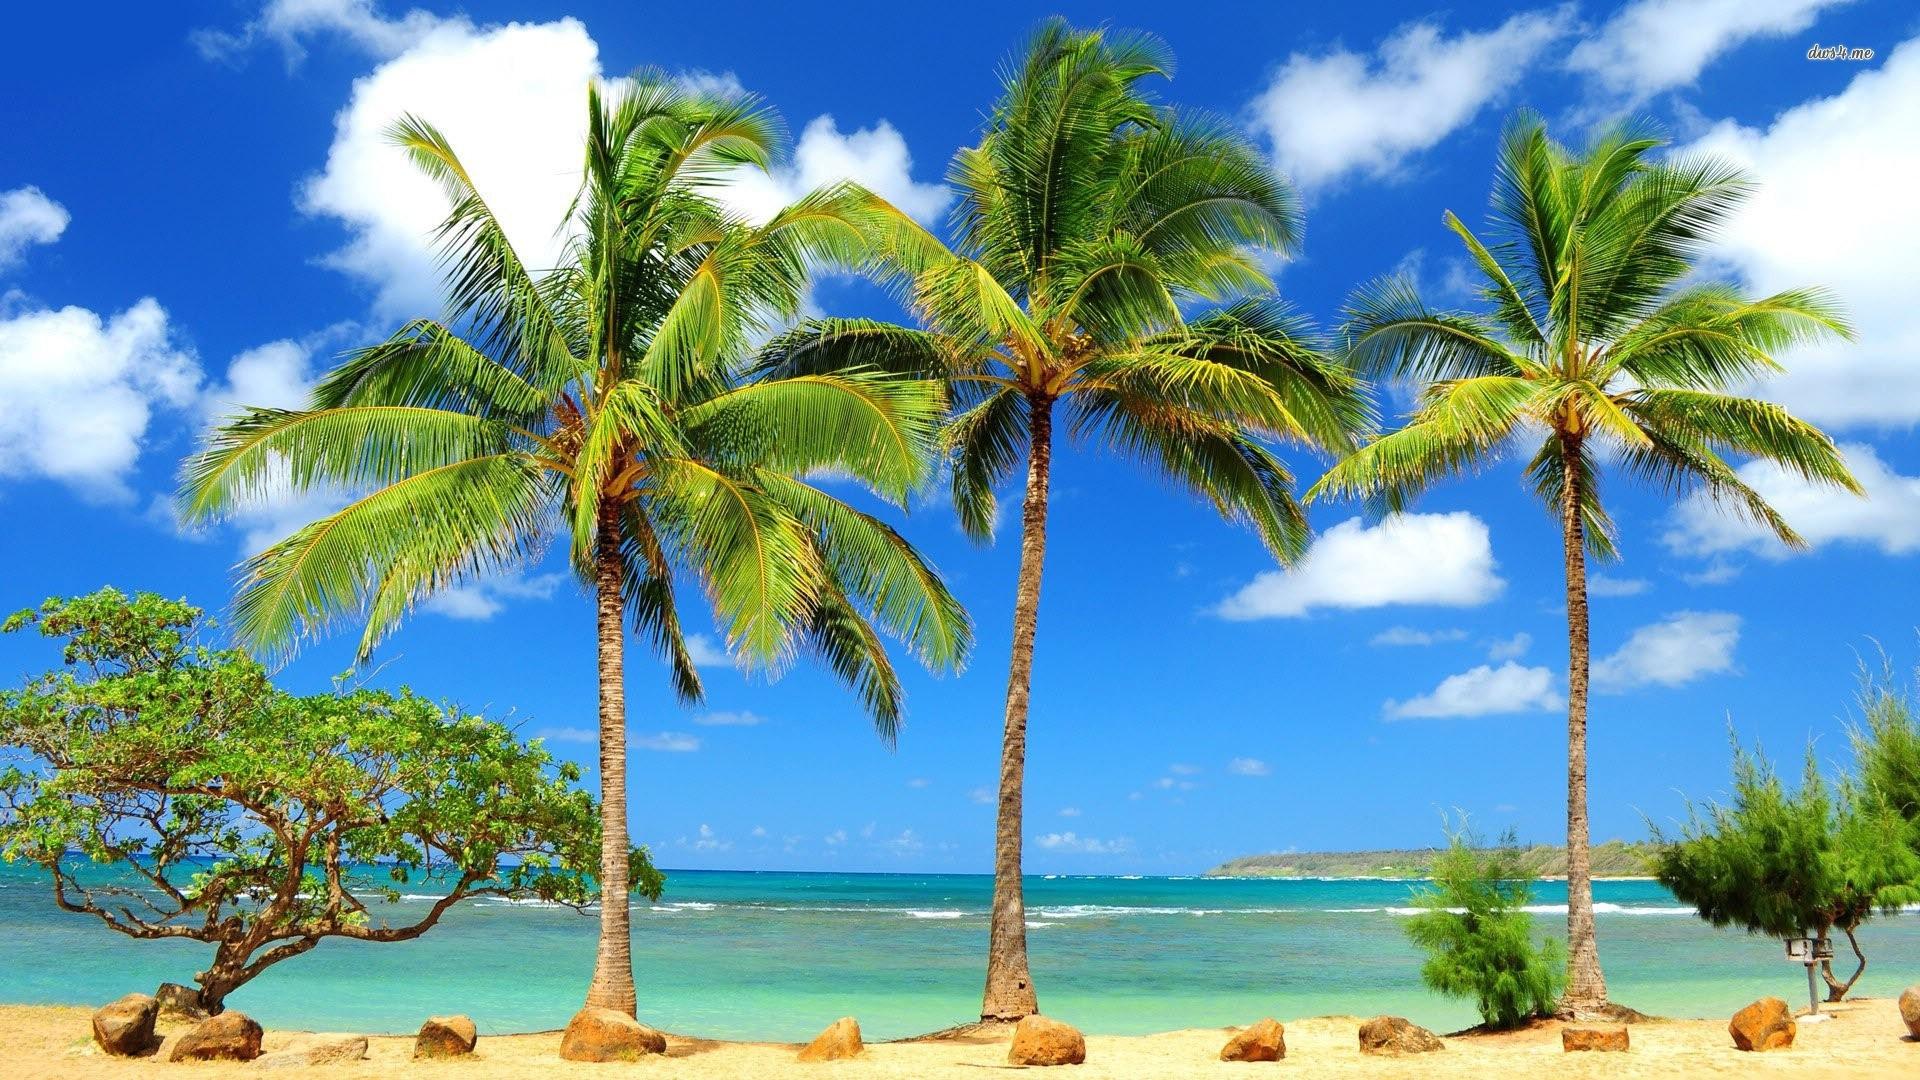 Palm Tree wallpaper photo hd